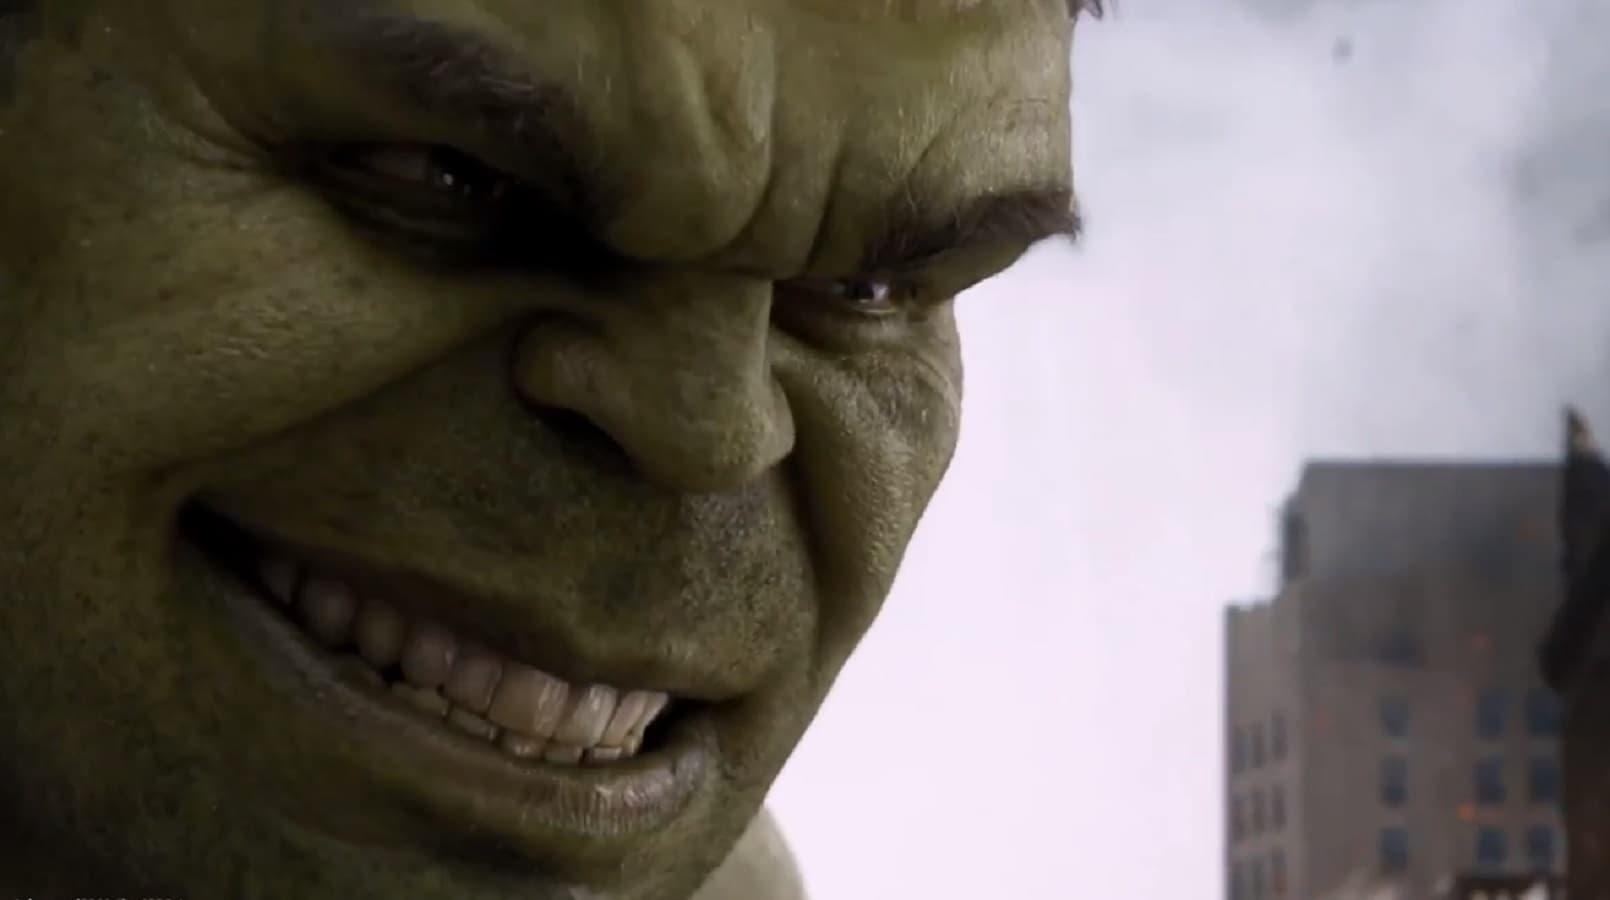 hulk from the avengers smashing